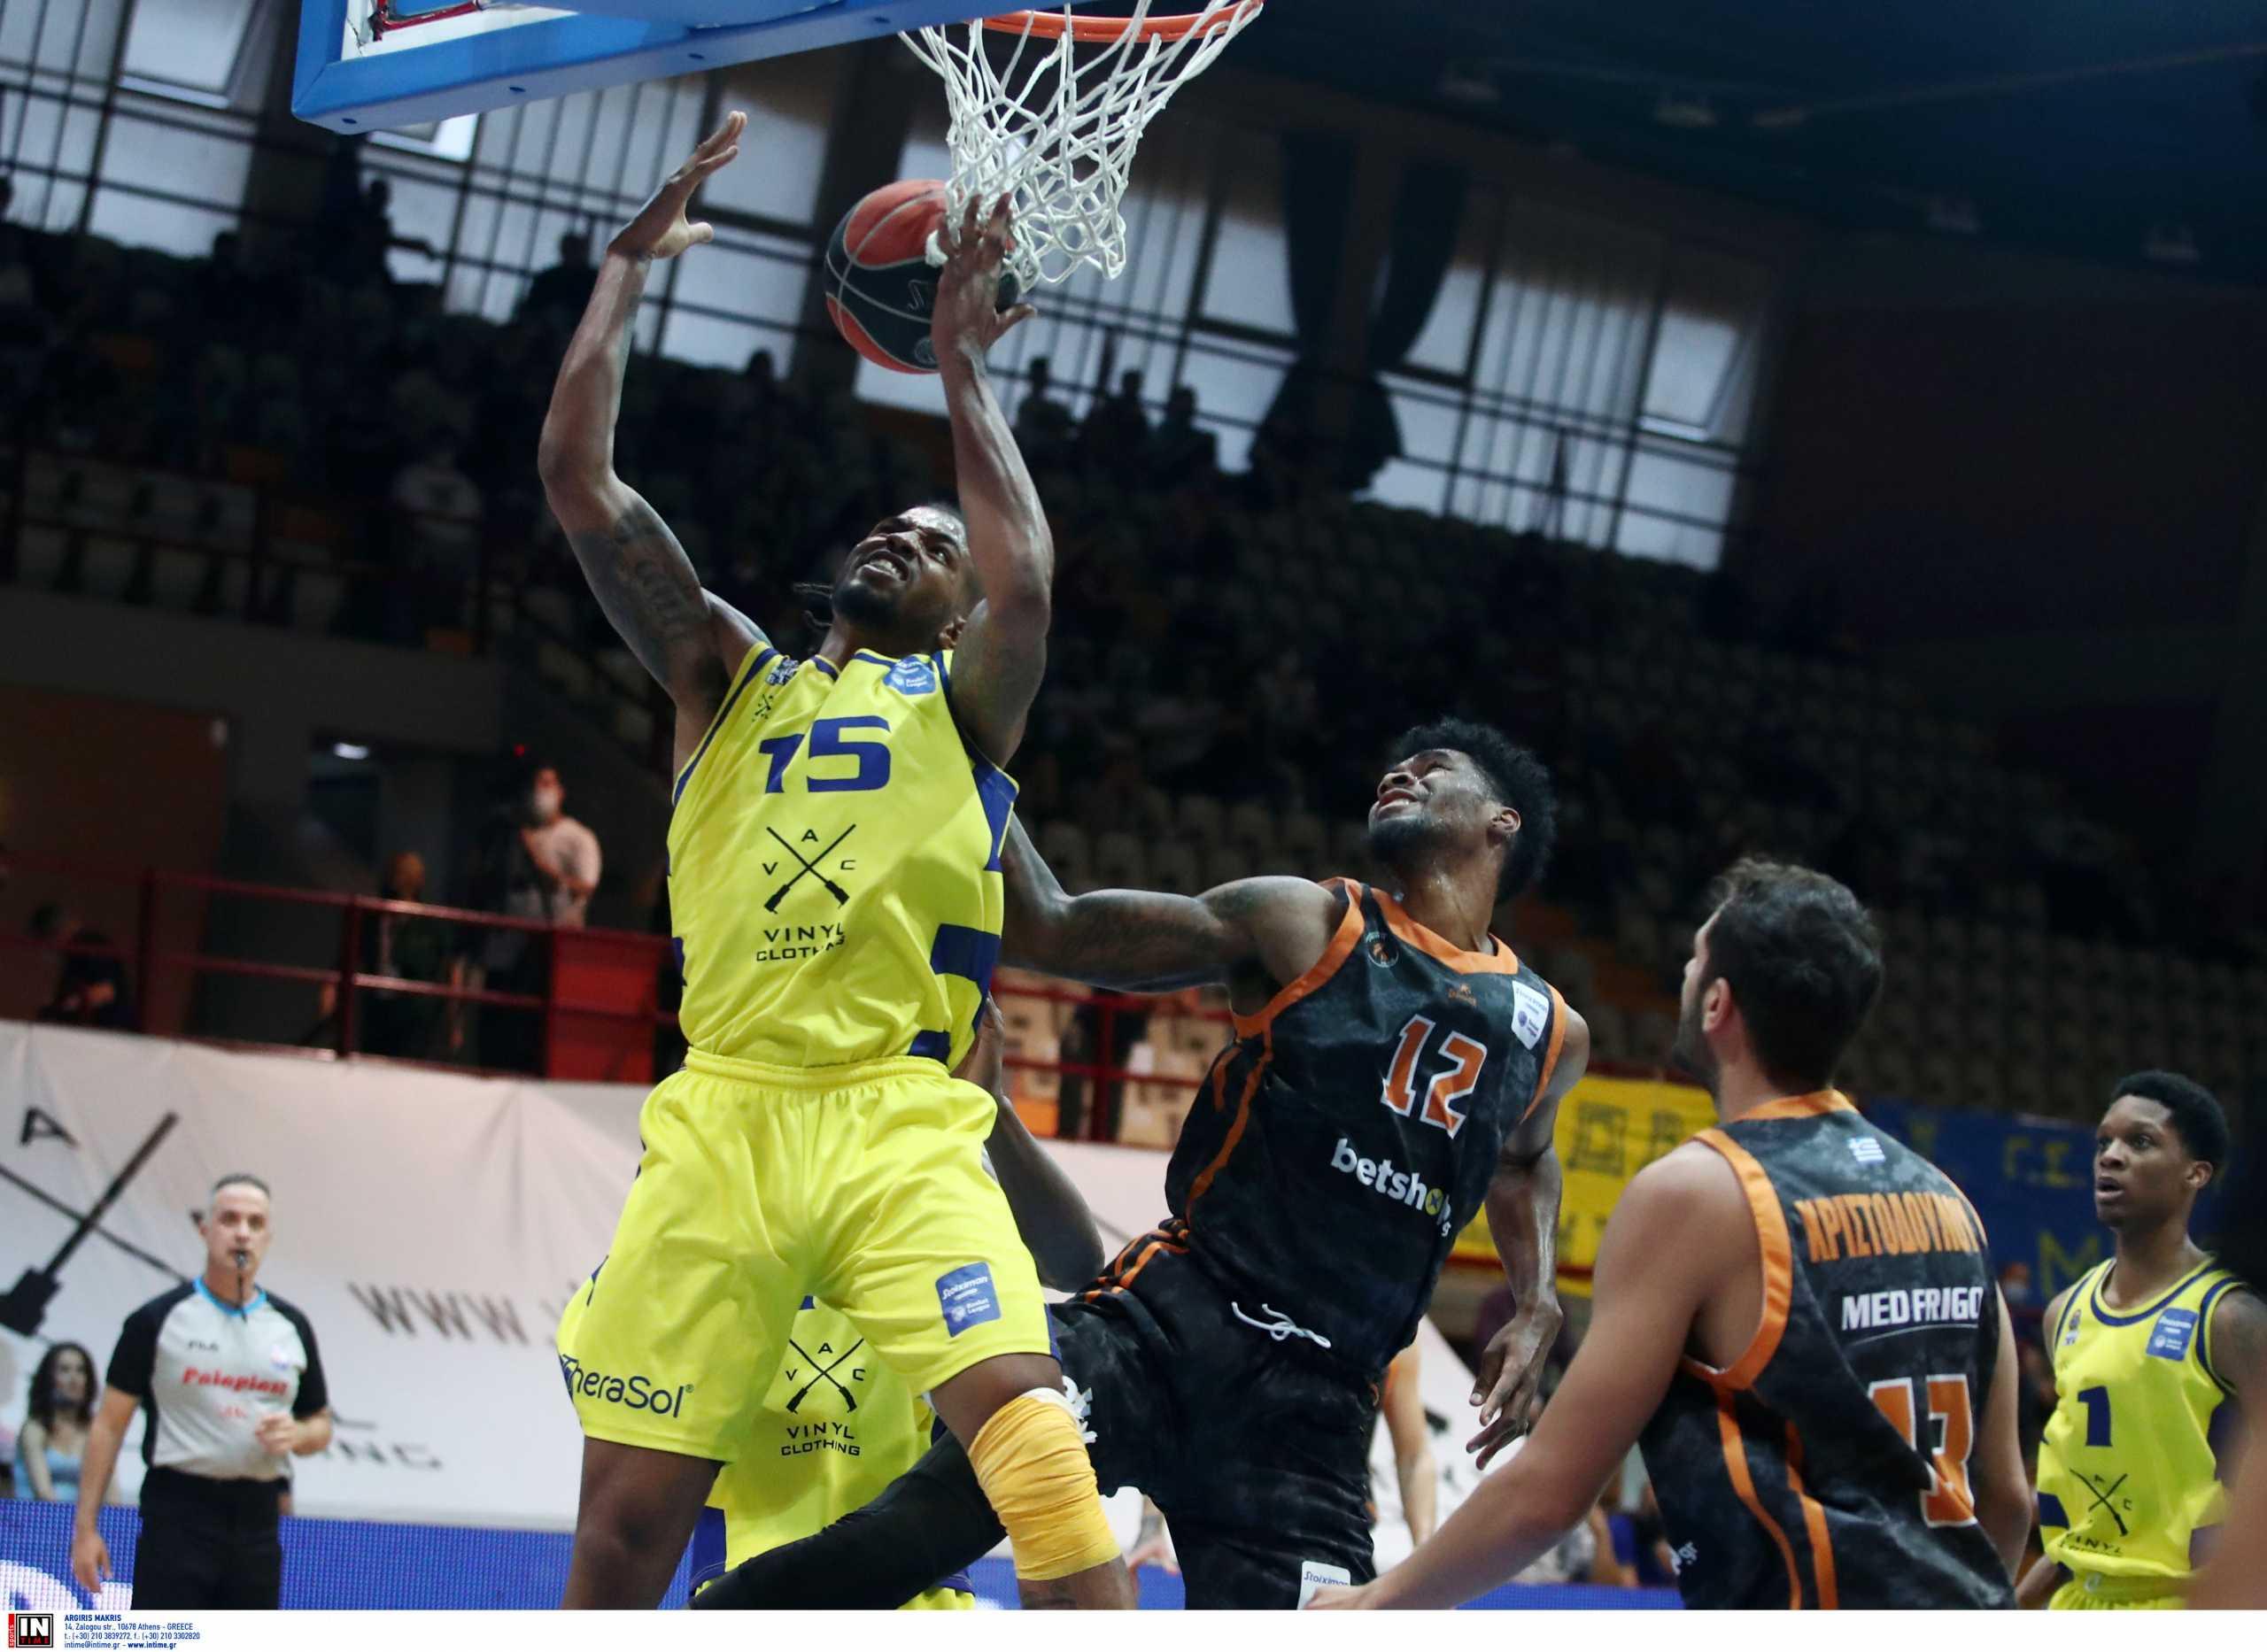 Basket League: Το Λαύριο πήρε το «θρίλερ» με τον Προμηθέα και έμεινε ζωντανό στα ημιτελικά